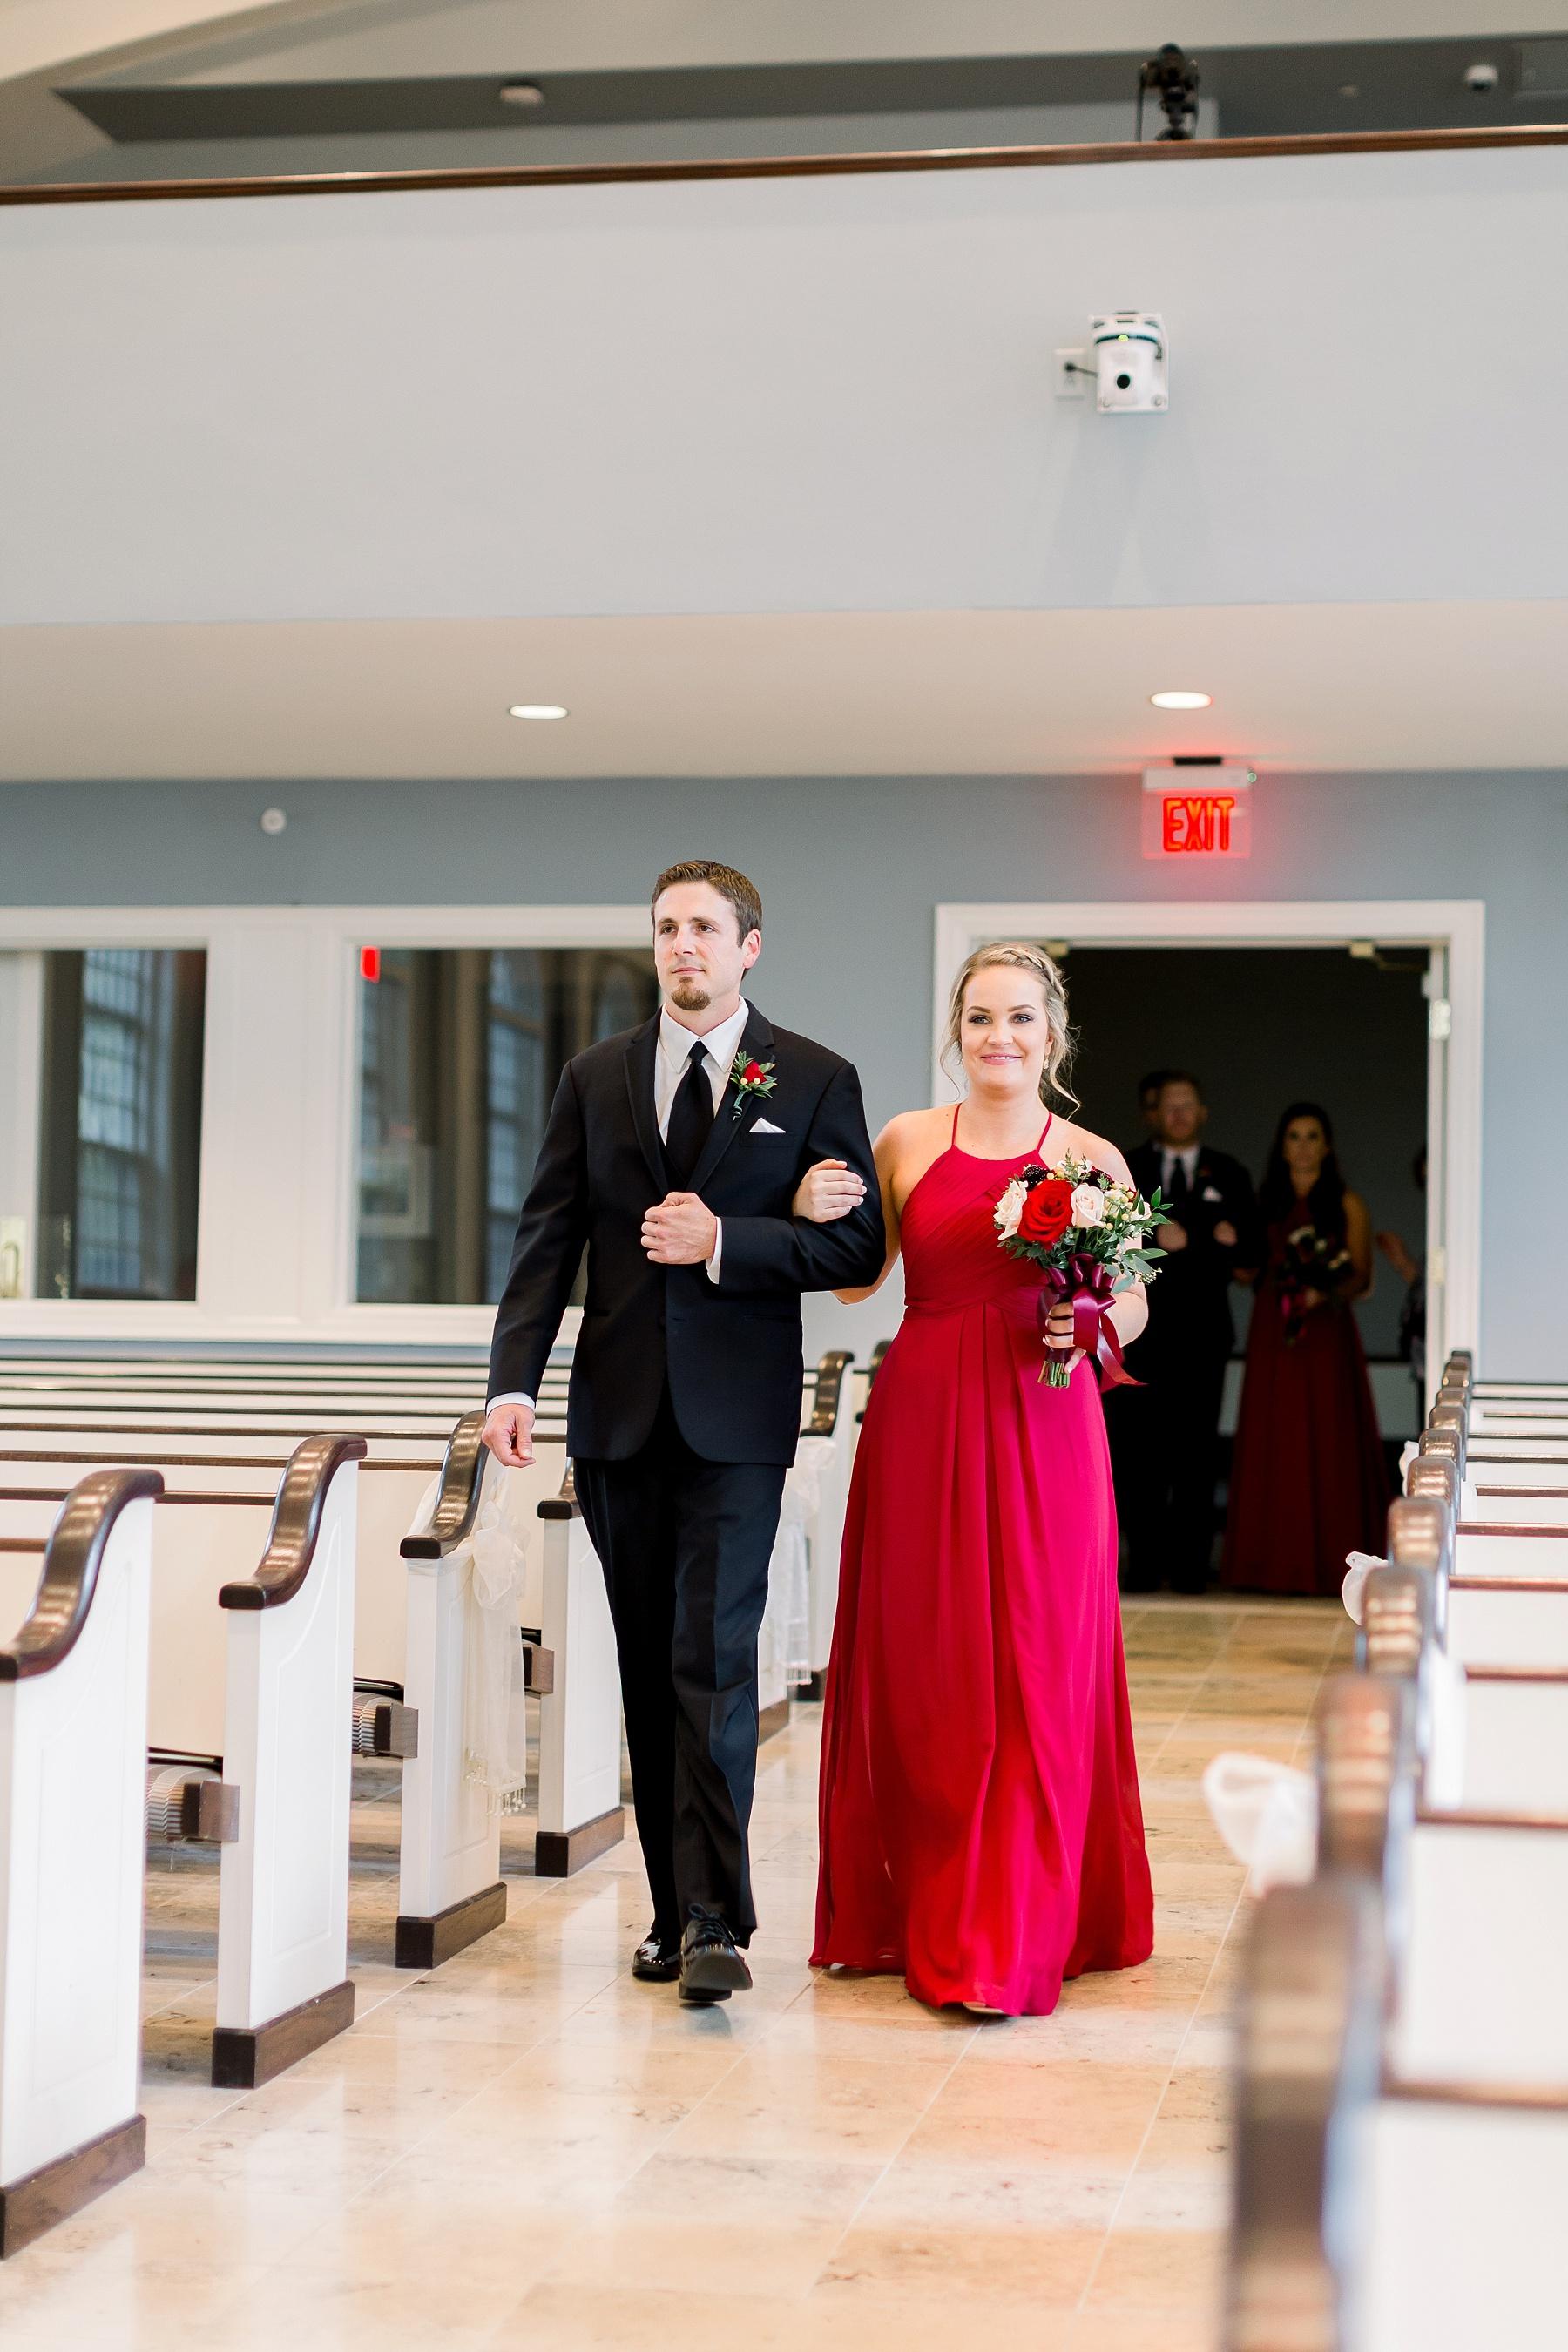 midwest-adventurous-wedding-photographer-elizabeth-ladean-photography-photo_4750.jpg